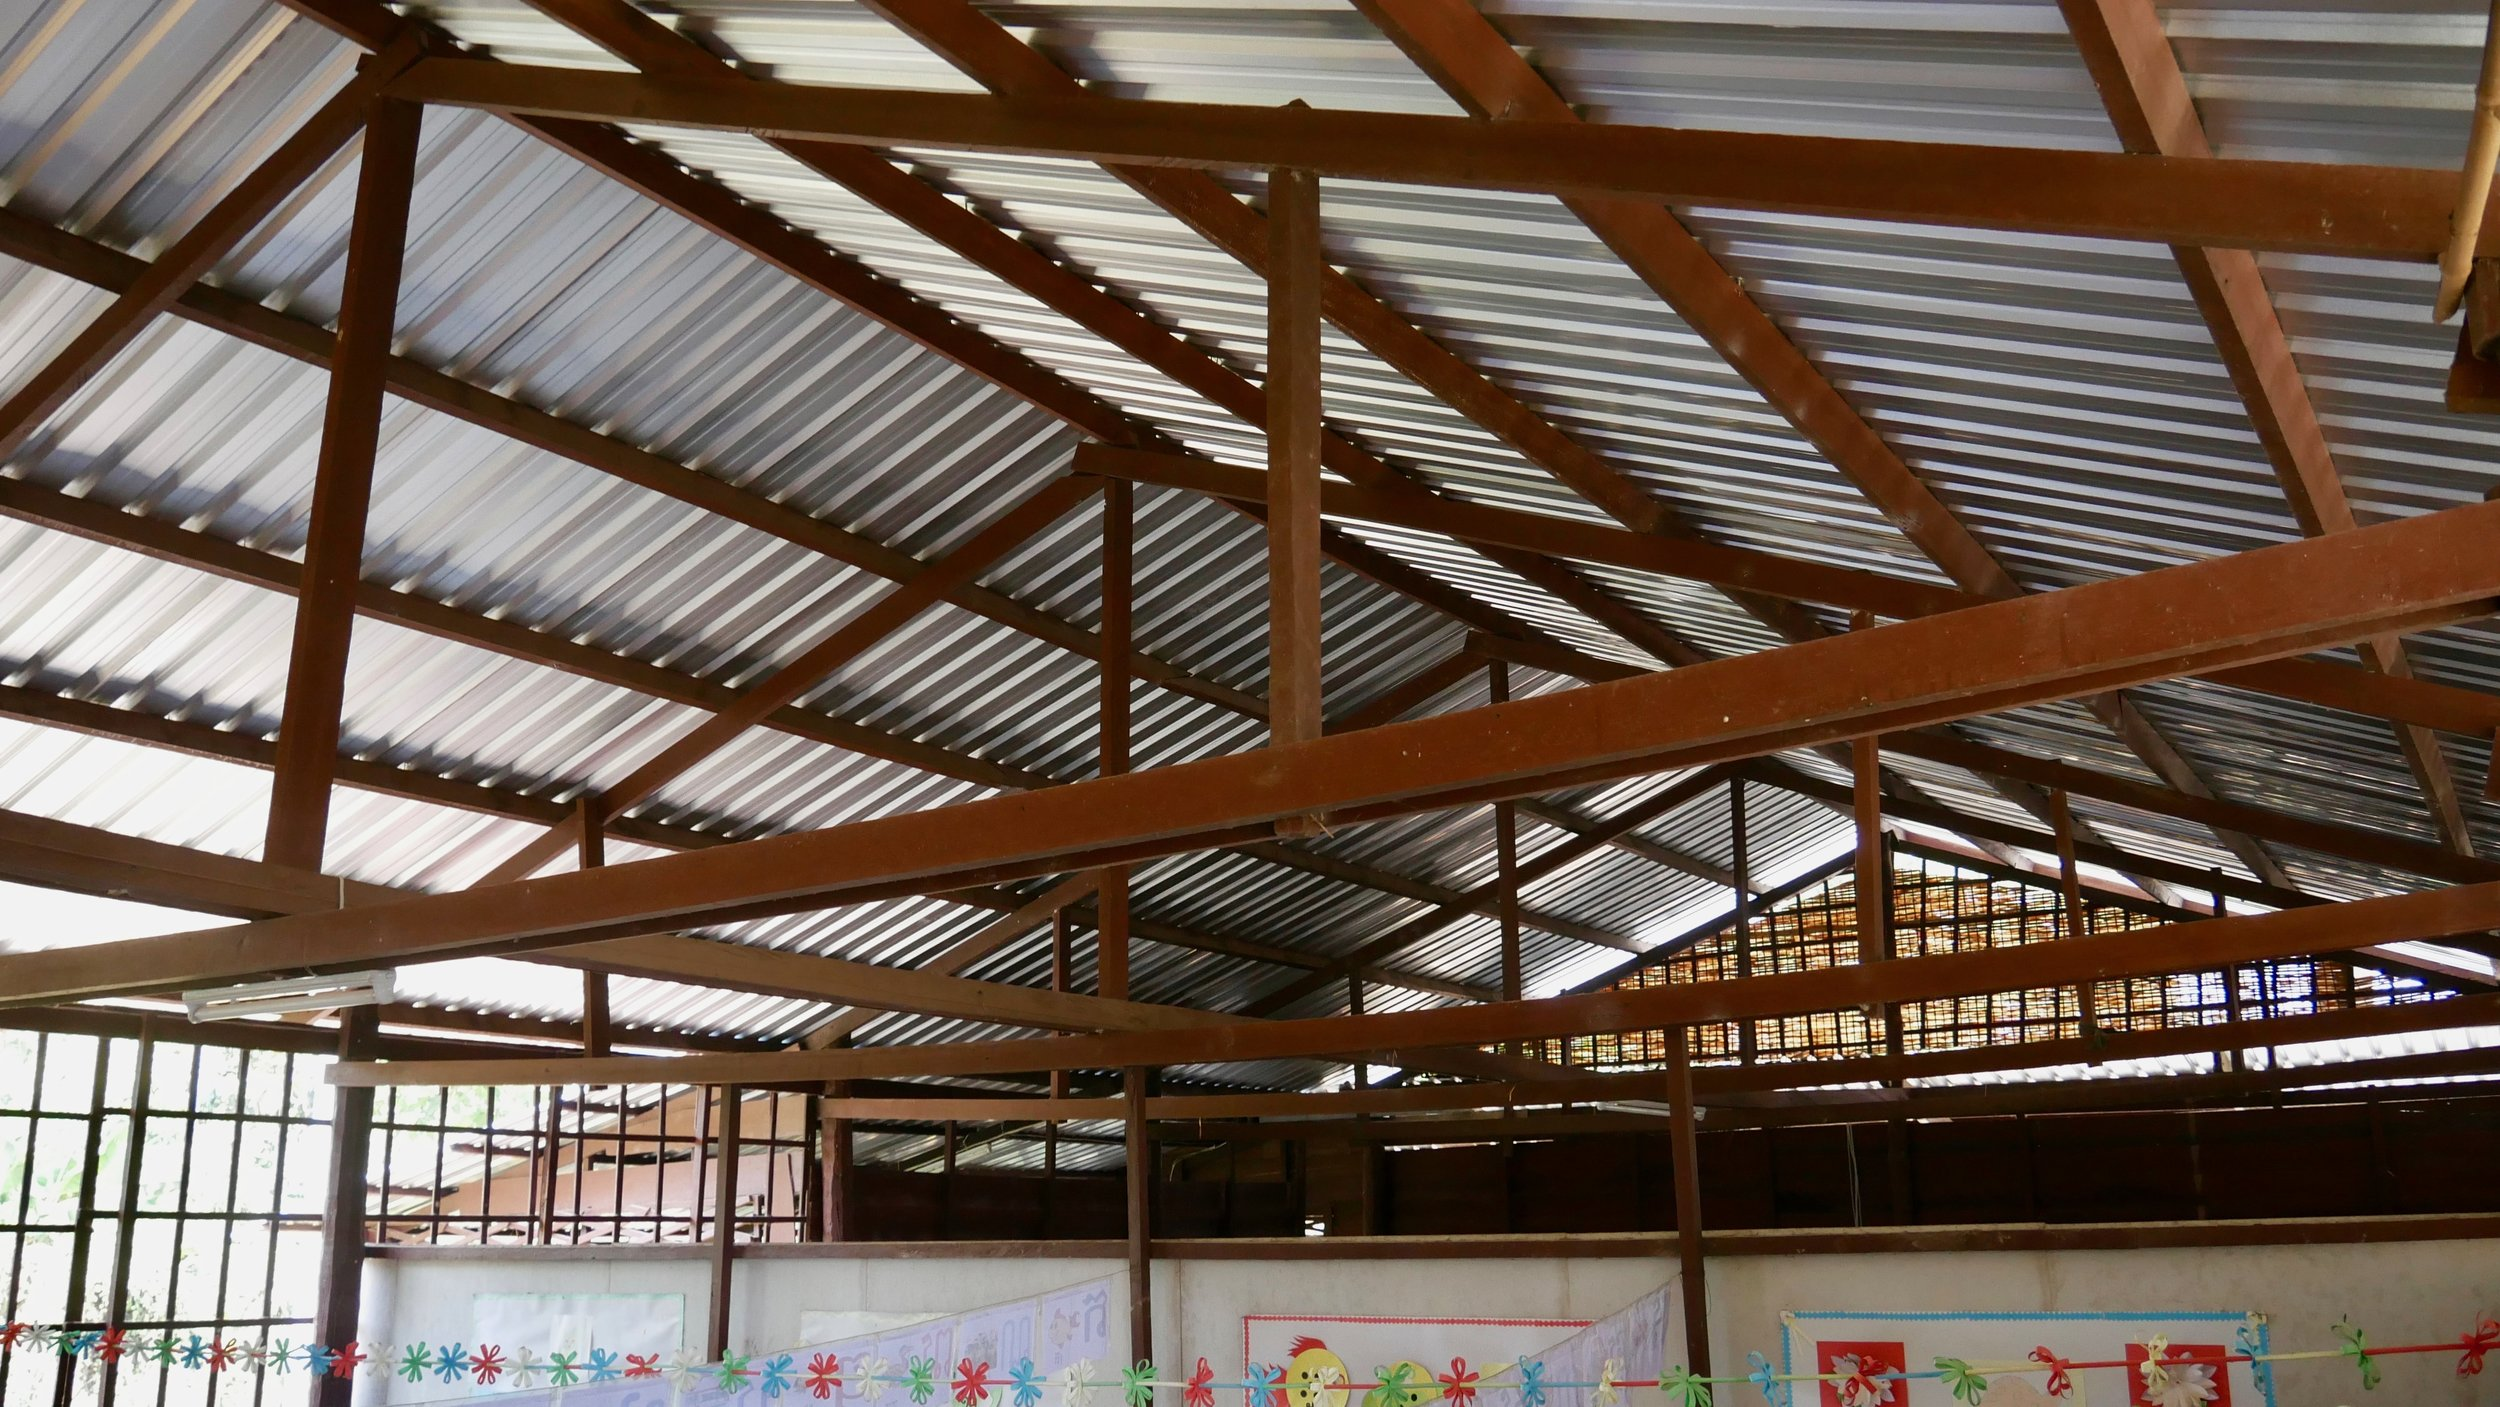 New School Roof